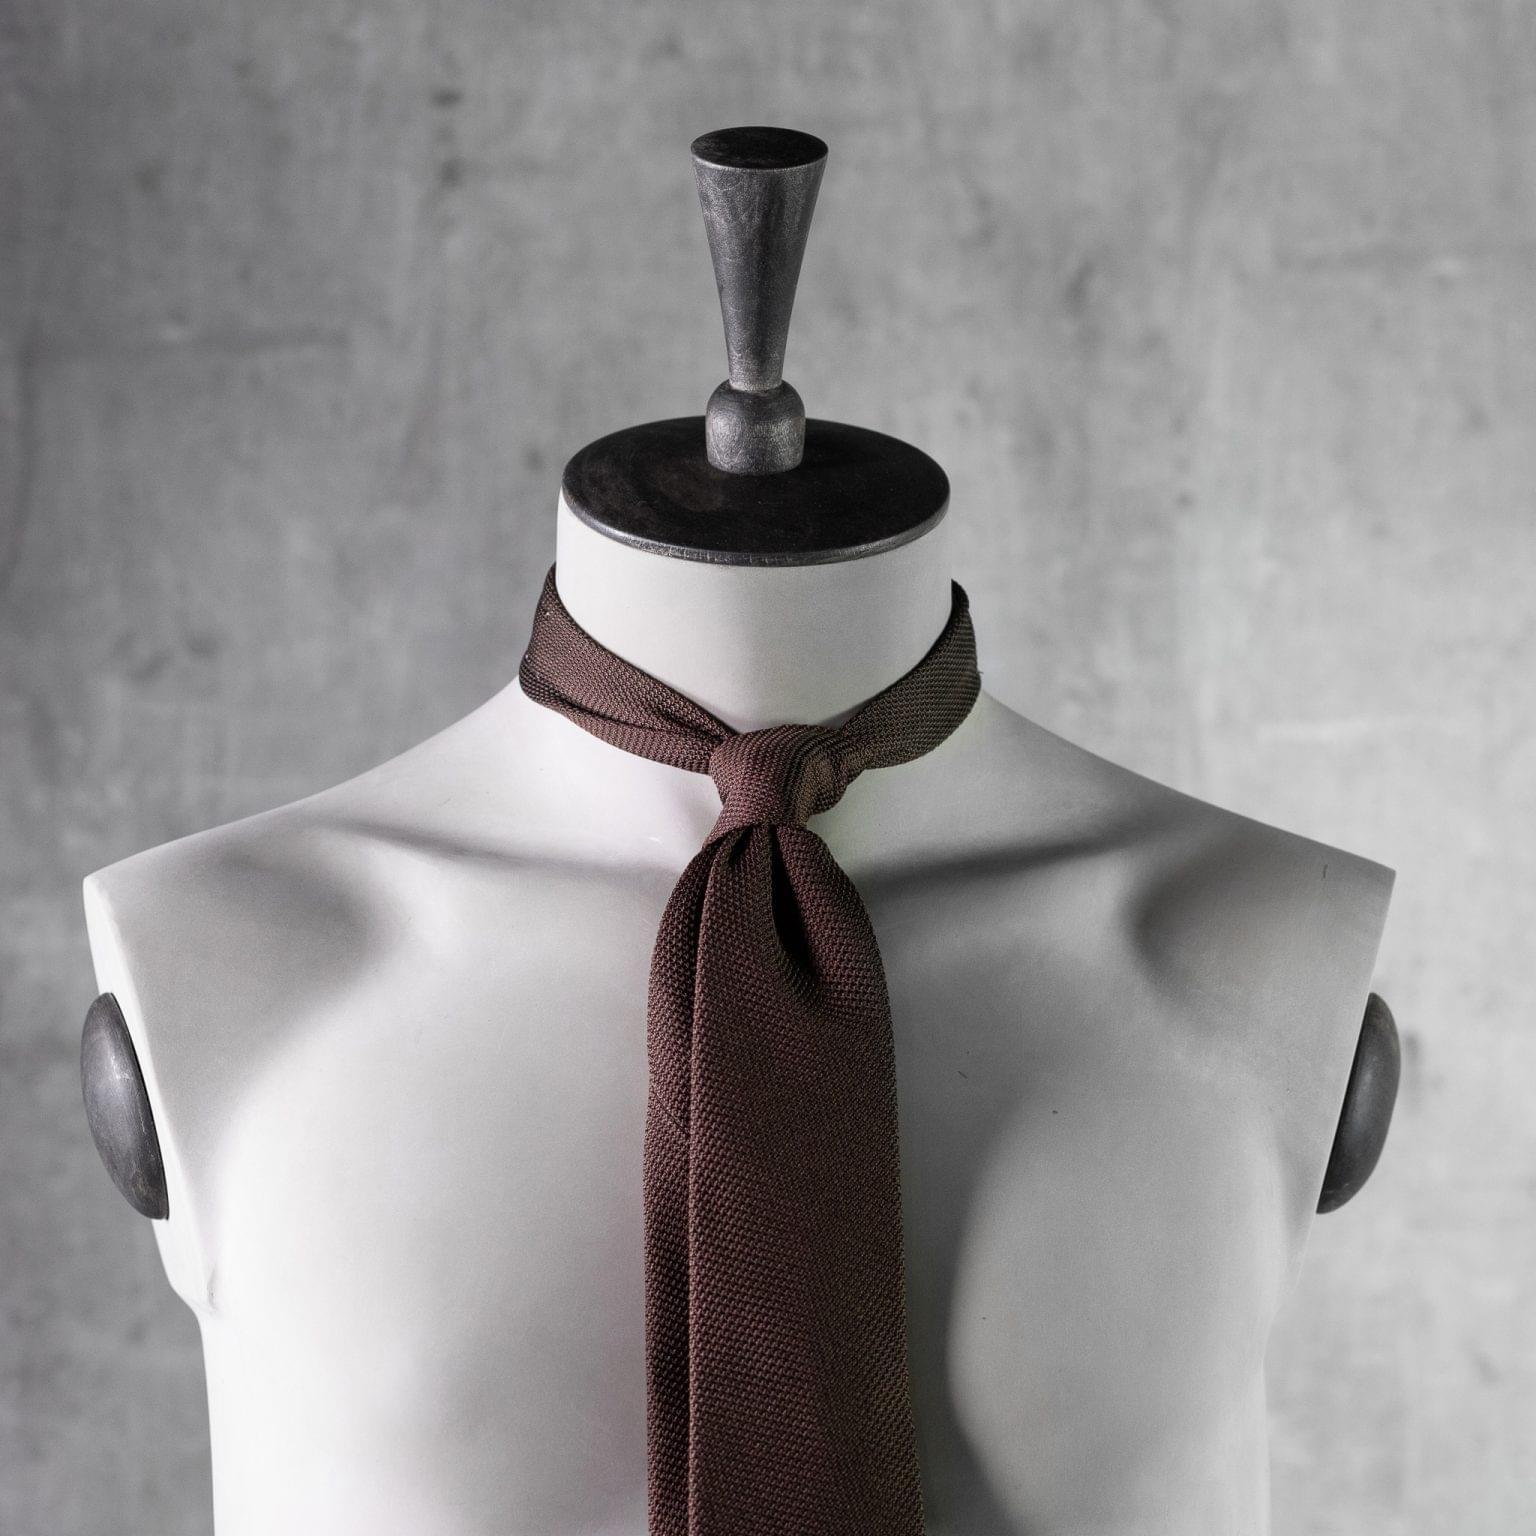 GRENADINE-0279-Tie-Initials-Corbata-Iniciales-The-Seelk-3